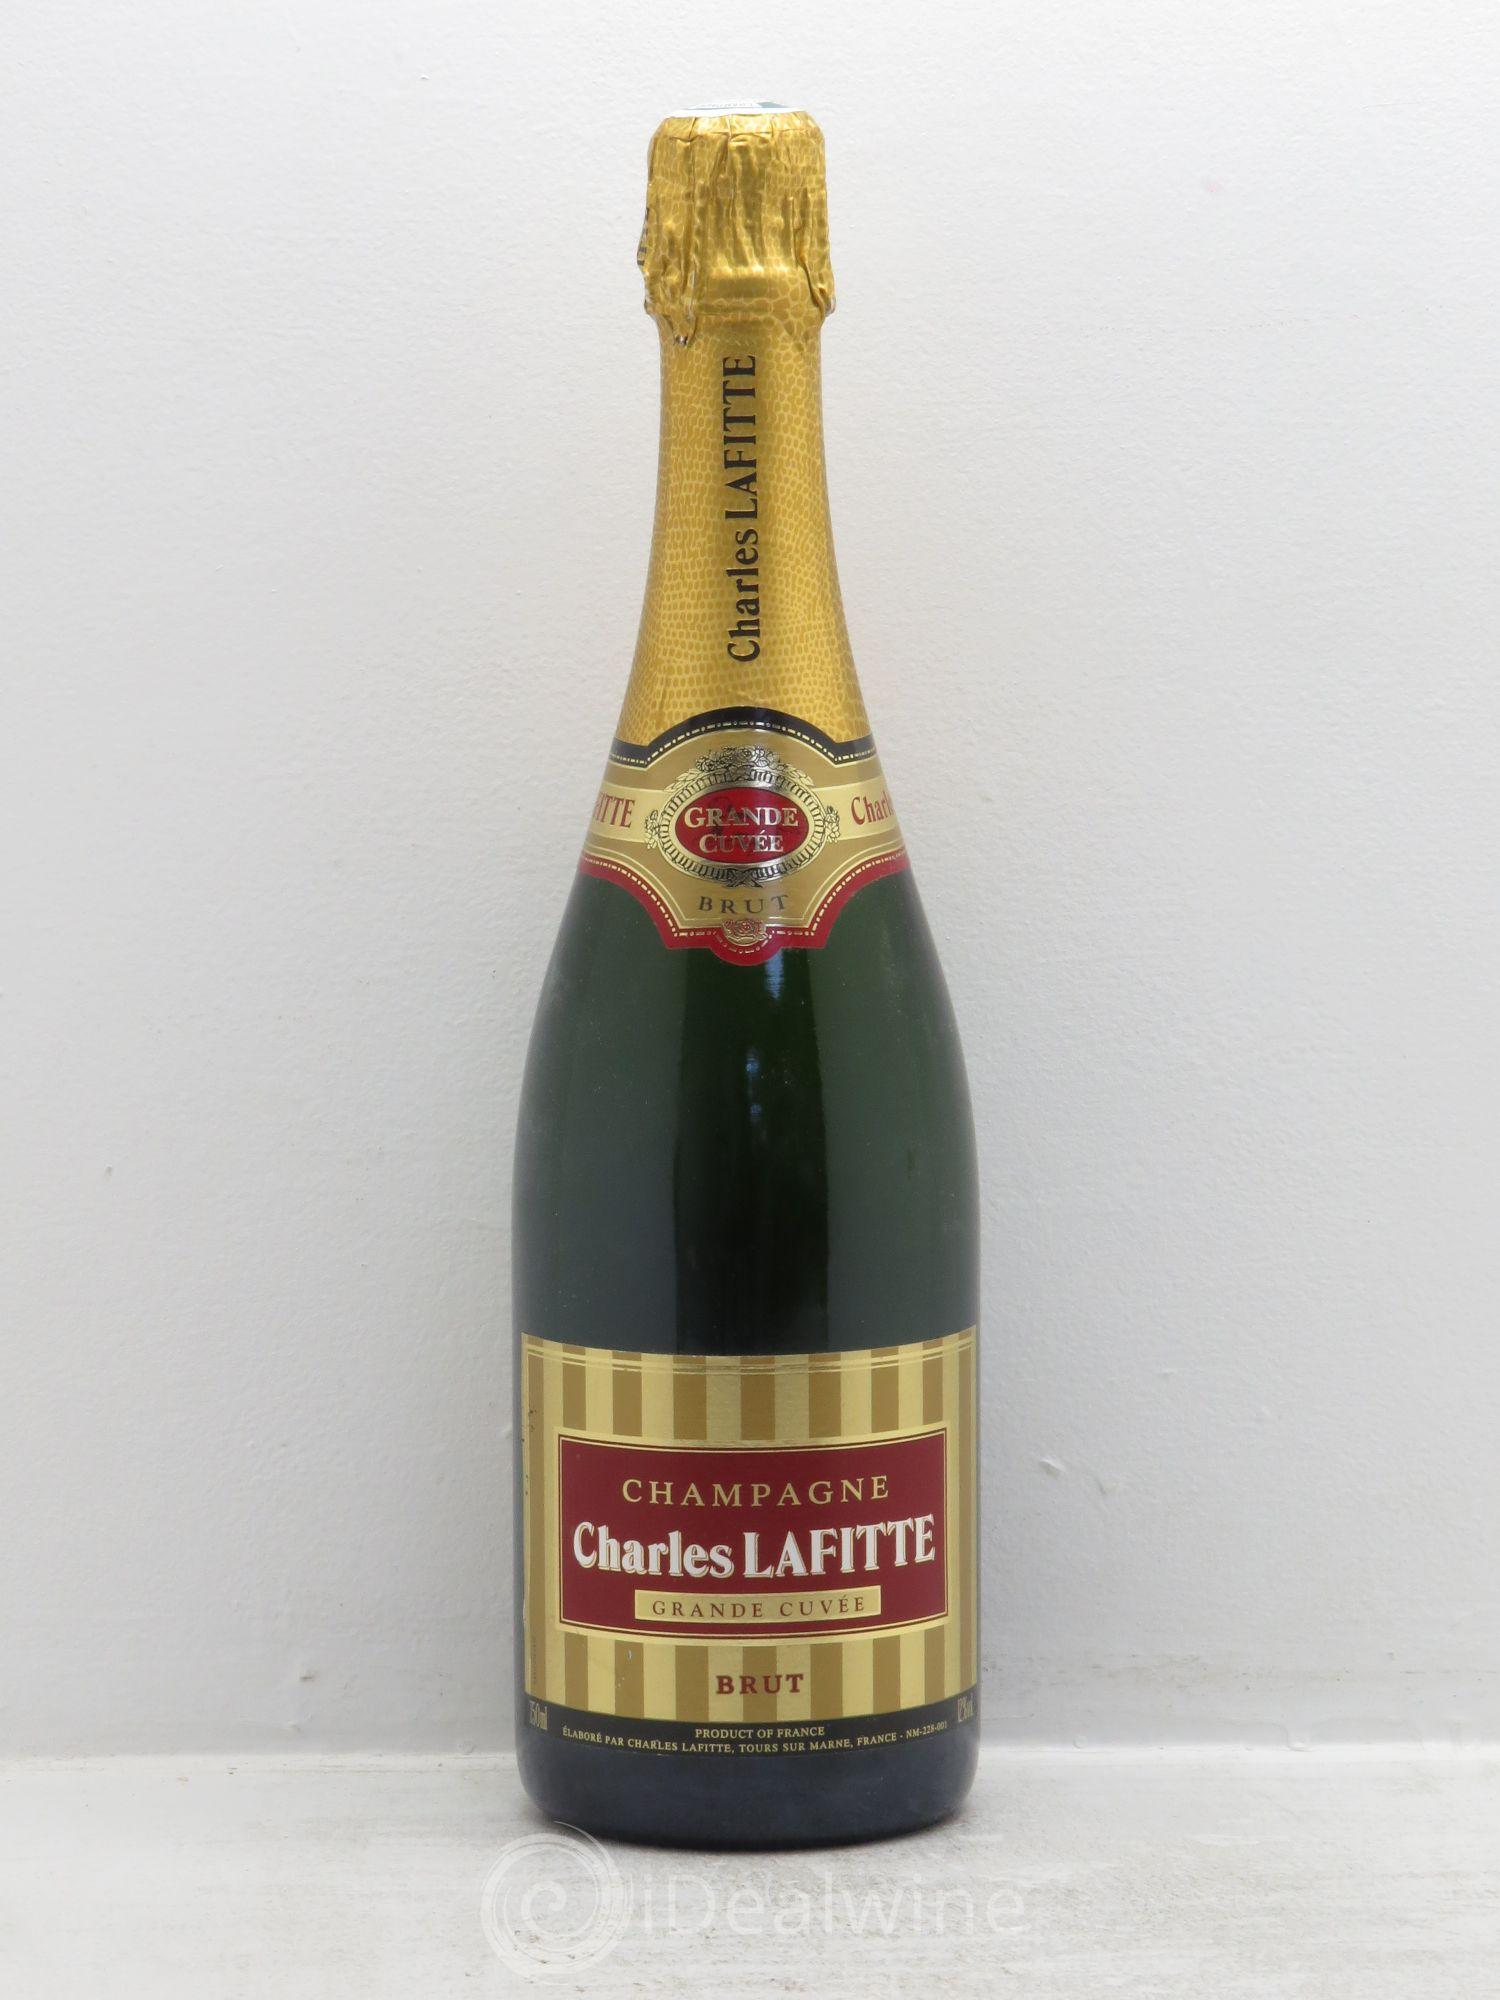 acheter brut champagne charles lafitte grande cuv e sans prix de r serve lot 1073. Black Bedroom Furniture Sets. Home Design Ideas